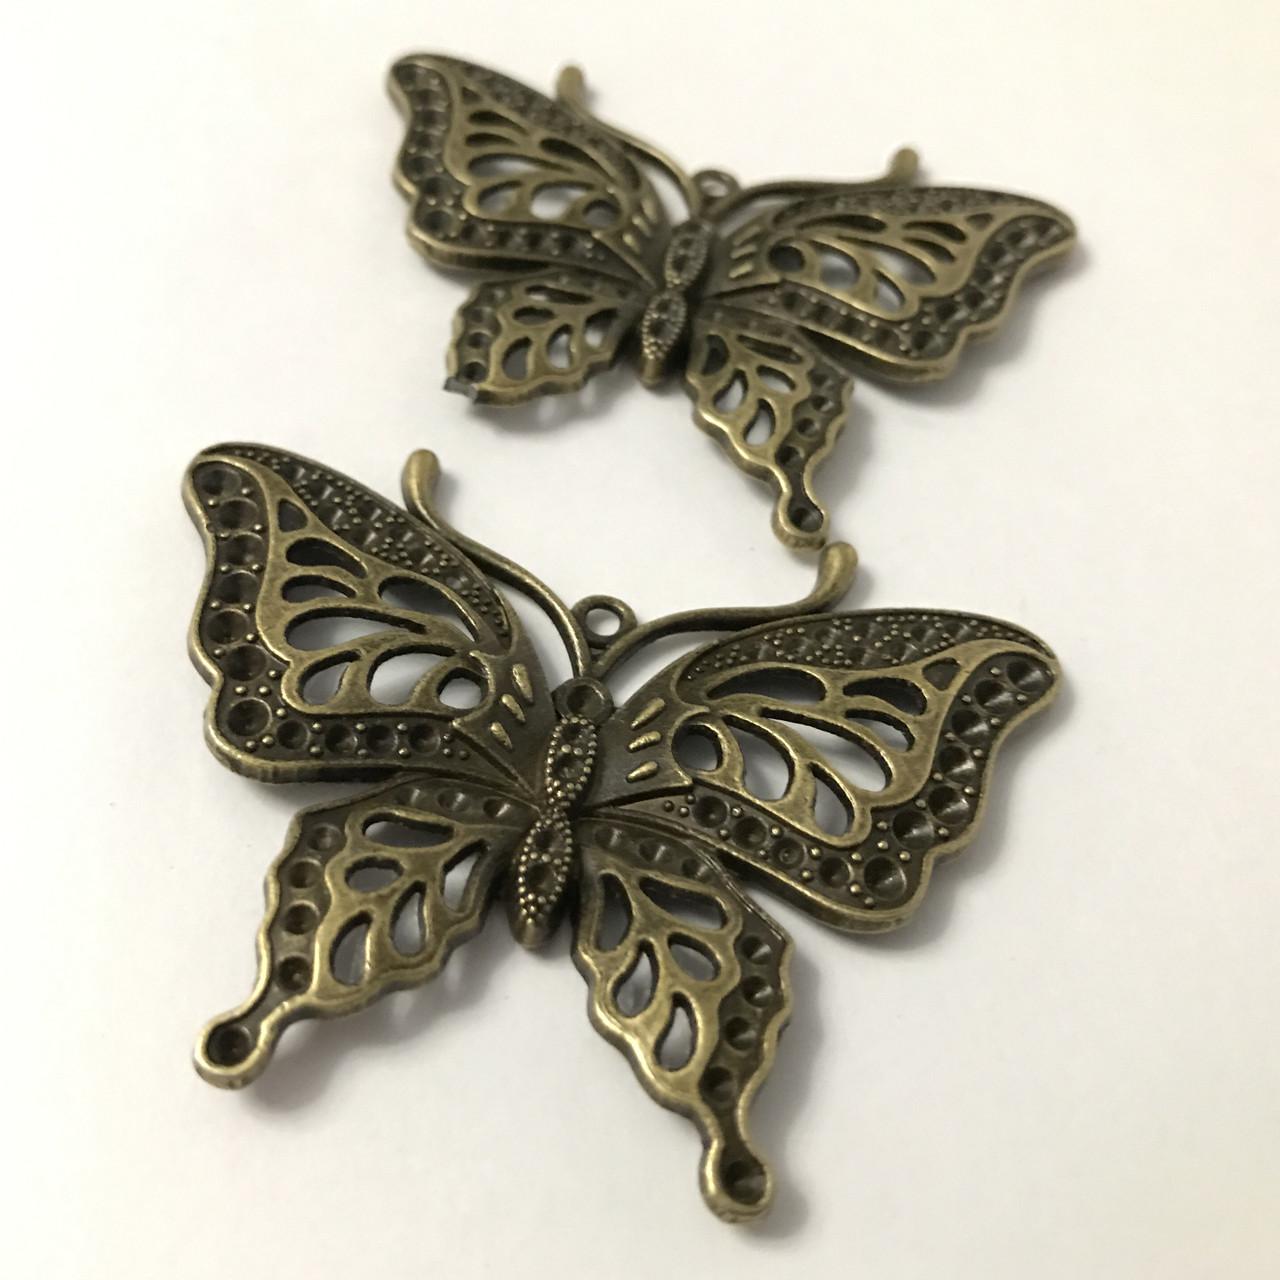 Металлические накладки декор. Бабочка. Цвет античная бронза. 60х50мм